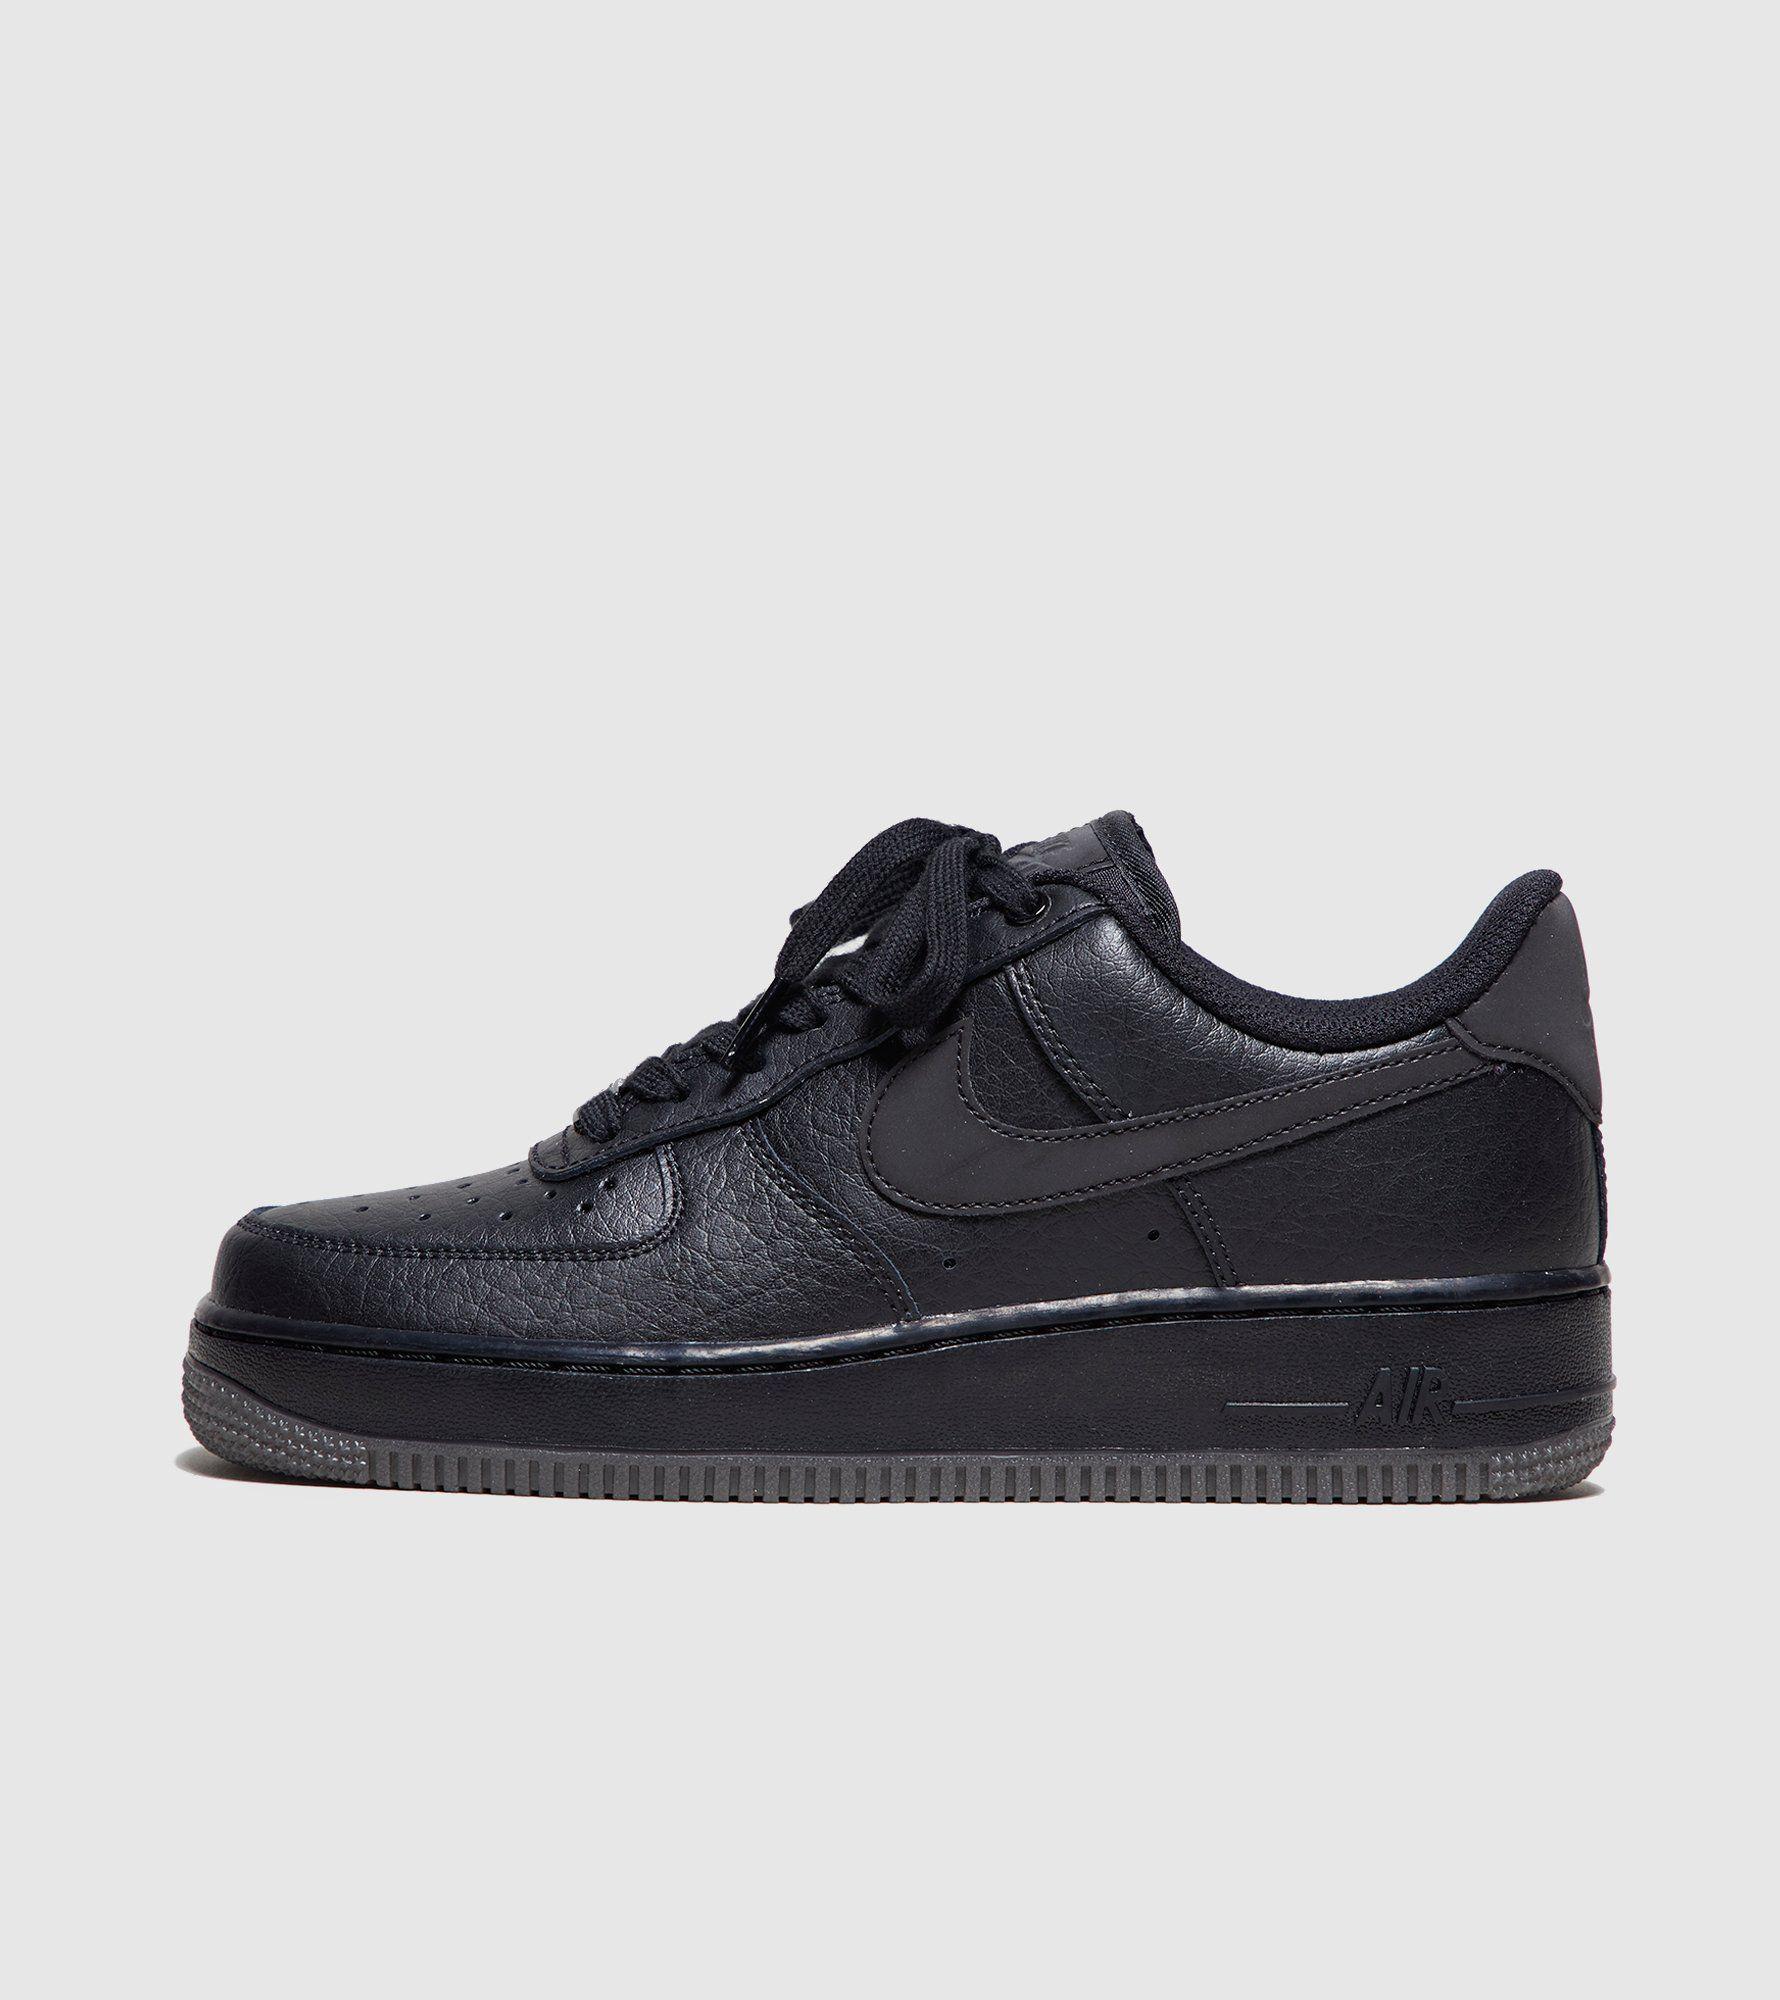 Nike Air Force 1 '07 Low Women's